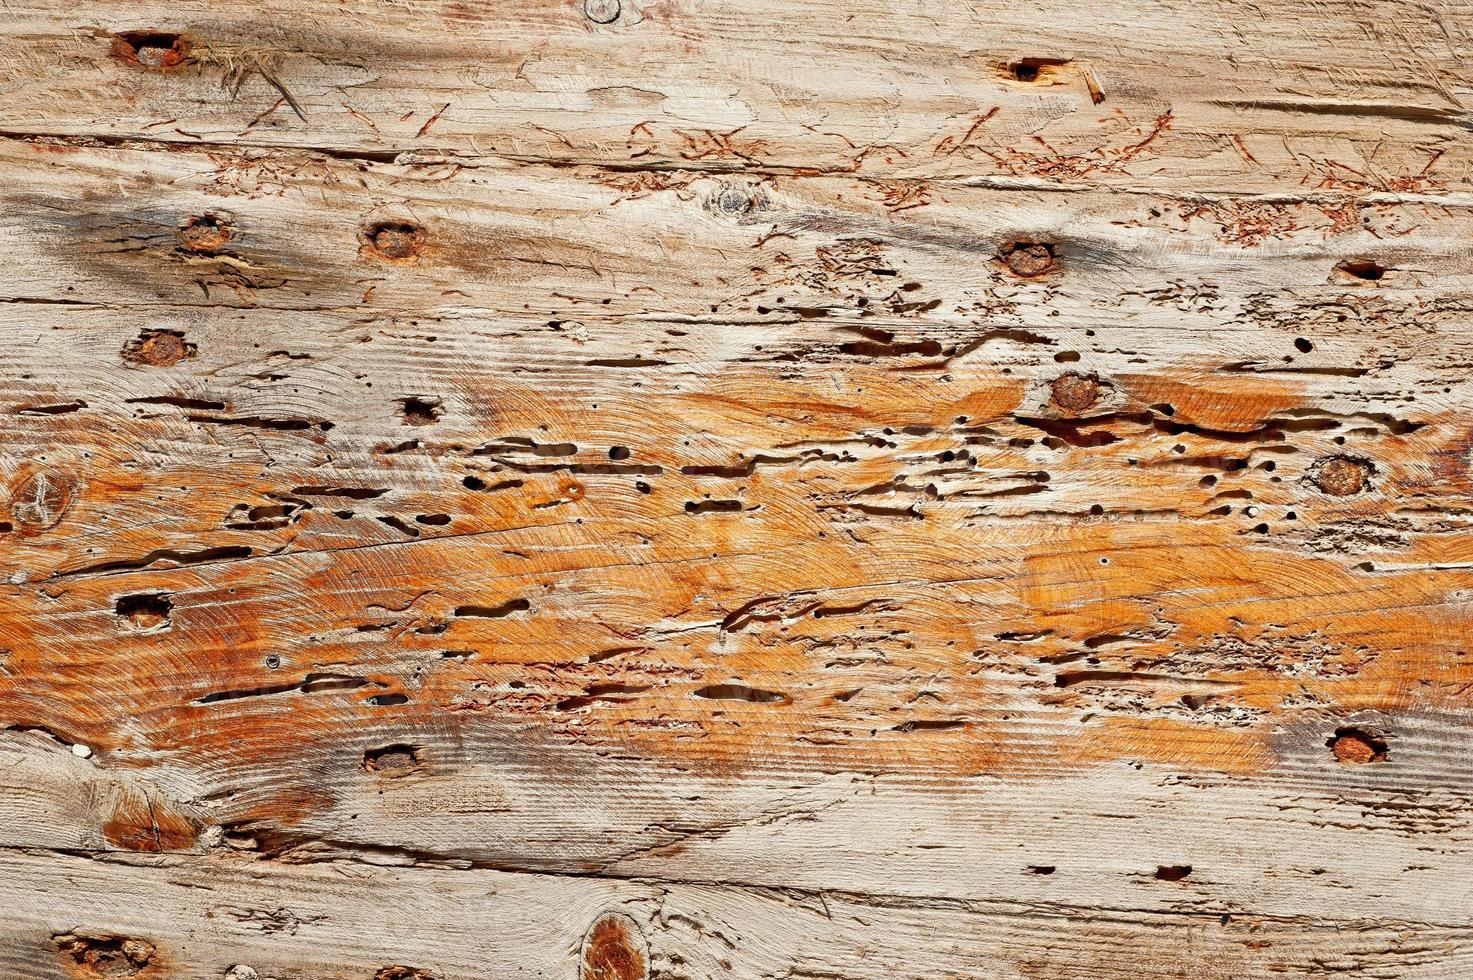 Anobium thomsoni daños en madera foto